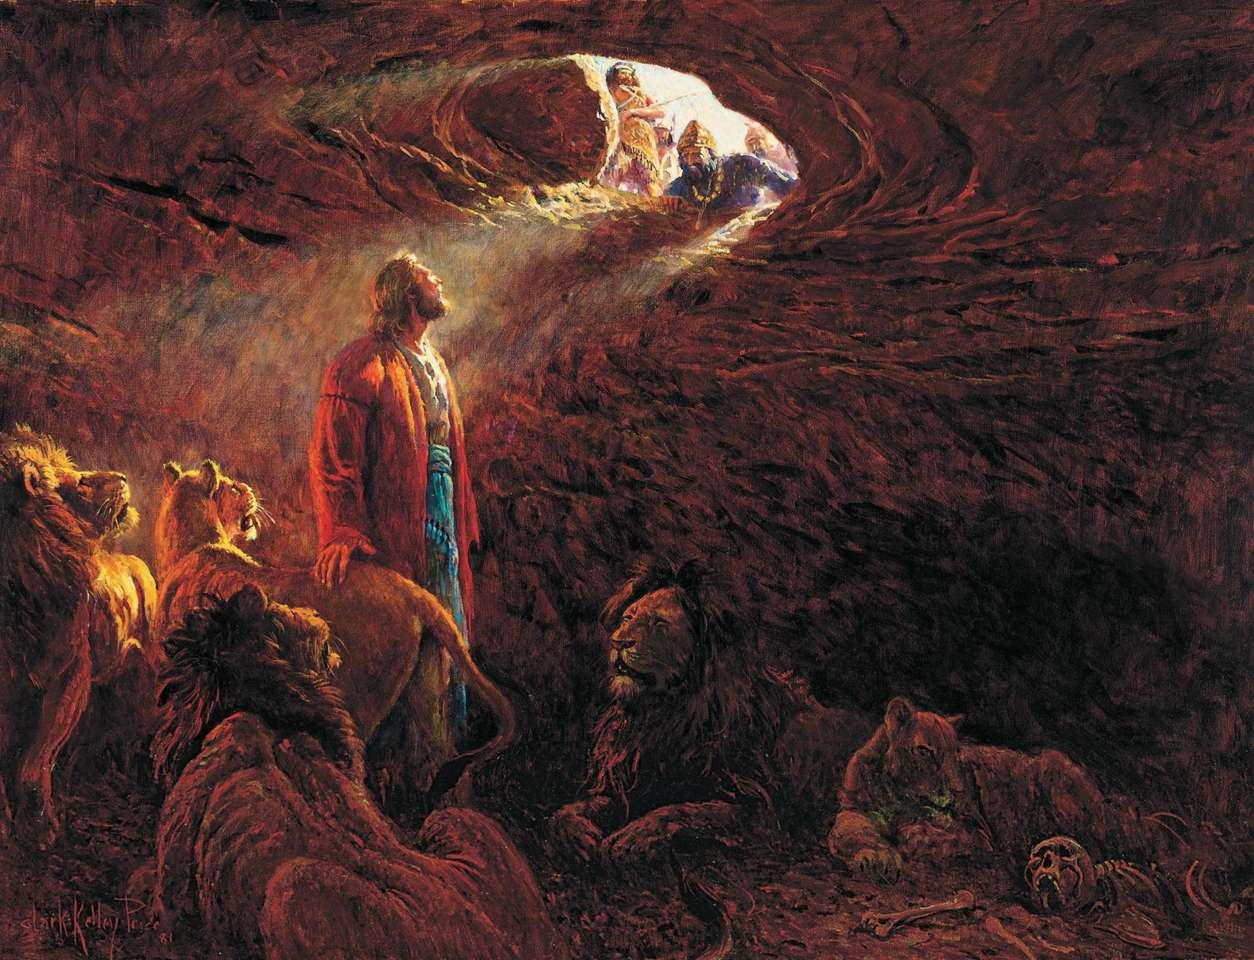 Daniel w jaskini lwa